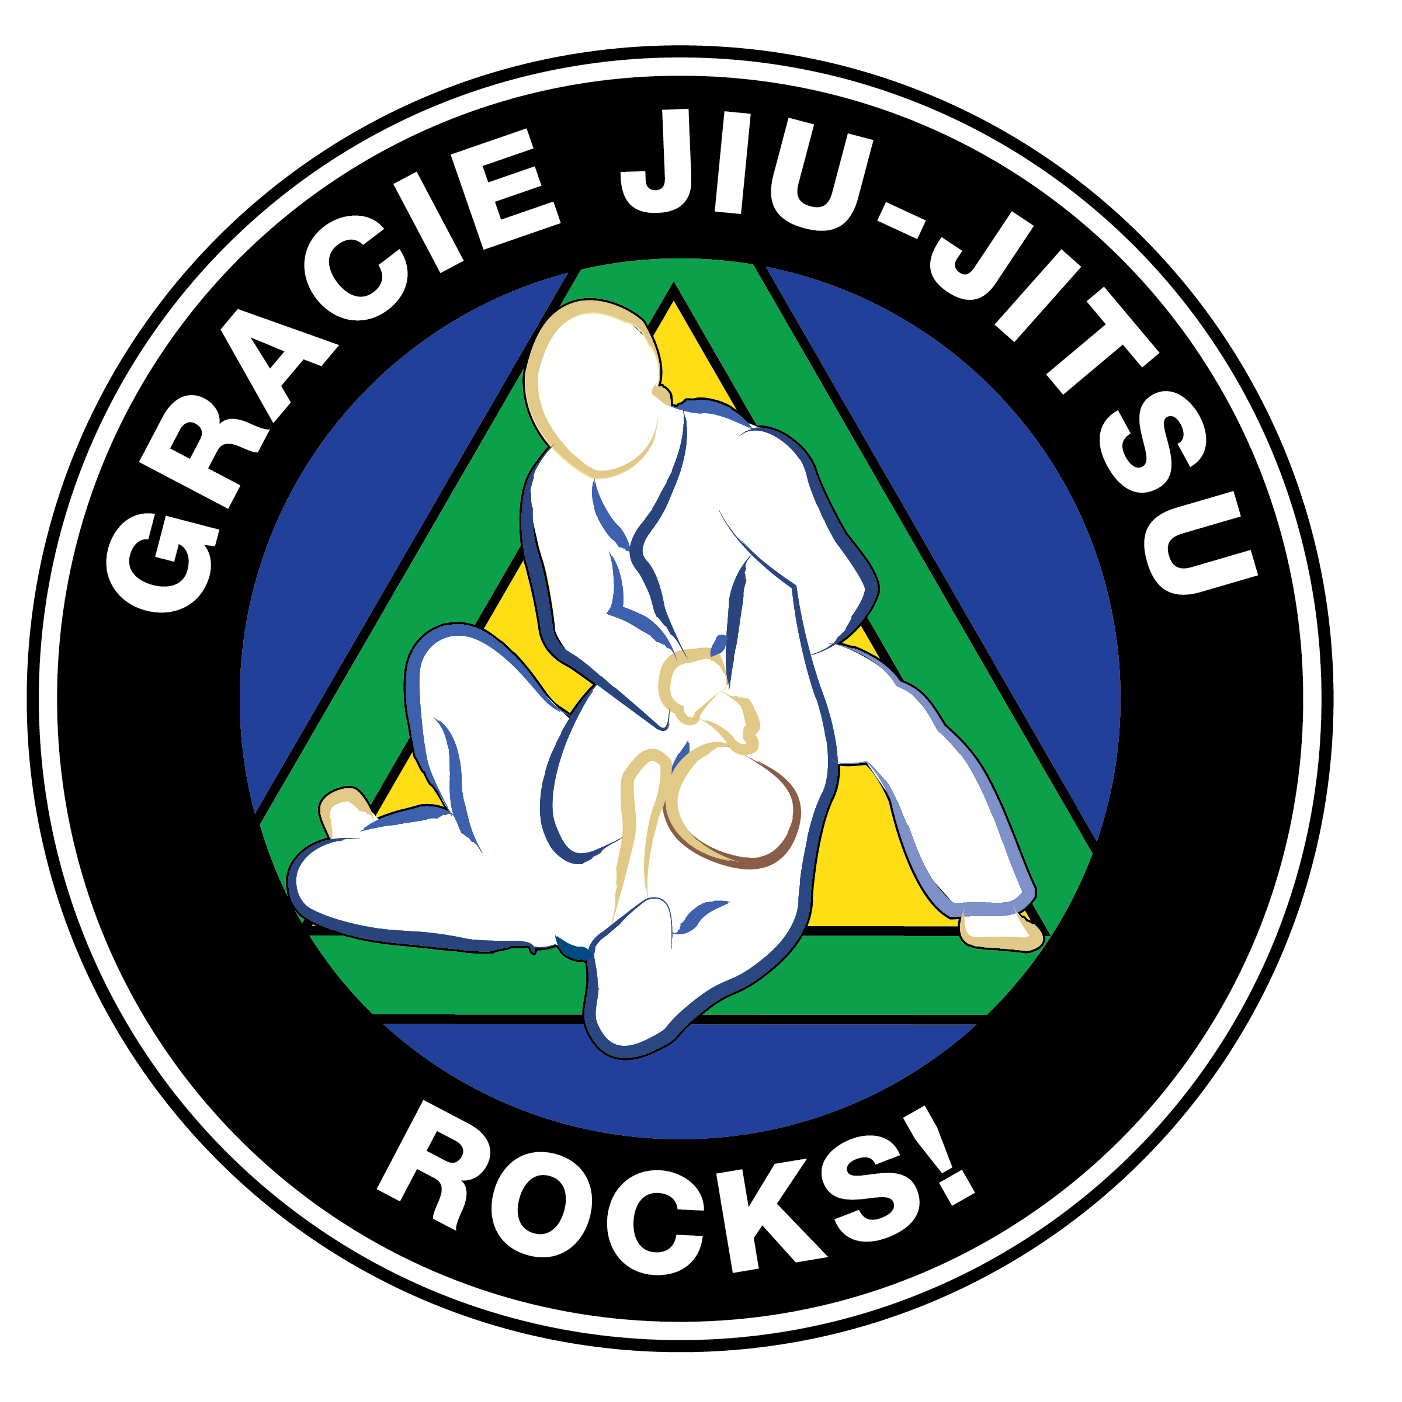 Gracie Jiu Jitsu Rocks! podcast